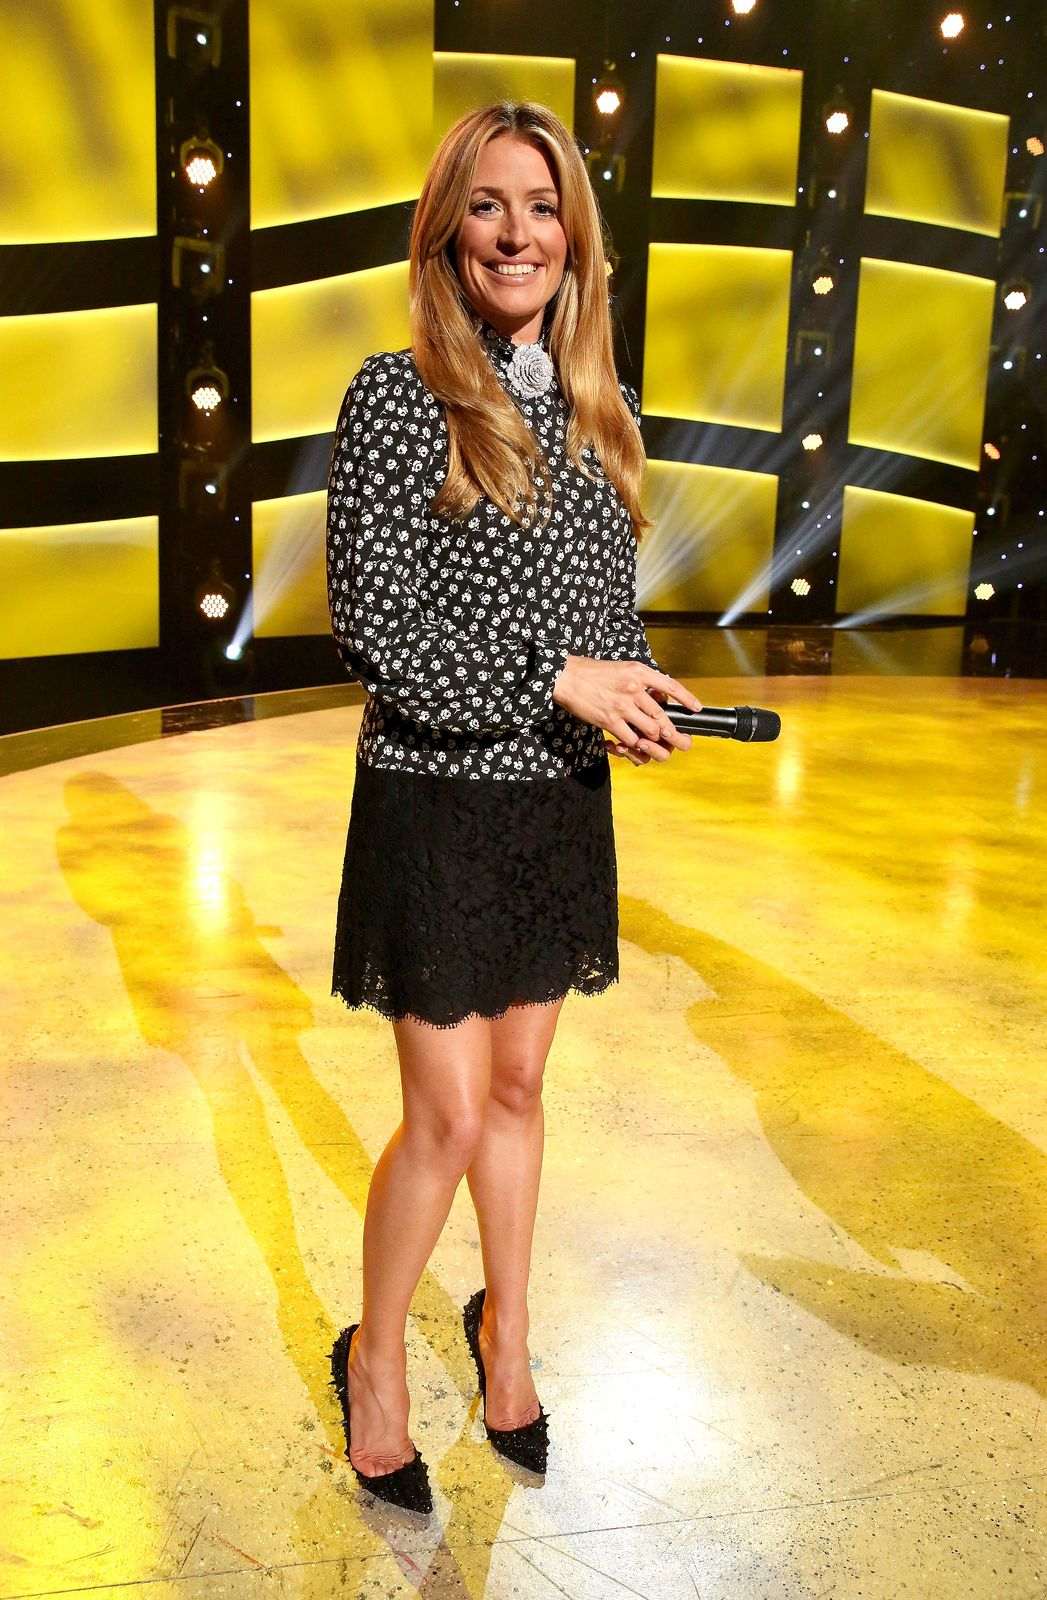 Cat Deeley    Dress: Dolce & Gabbana  Shoes: Christian Louboutin  Jewelry: XIV Karats